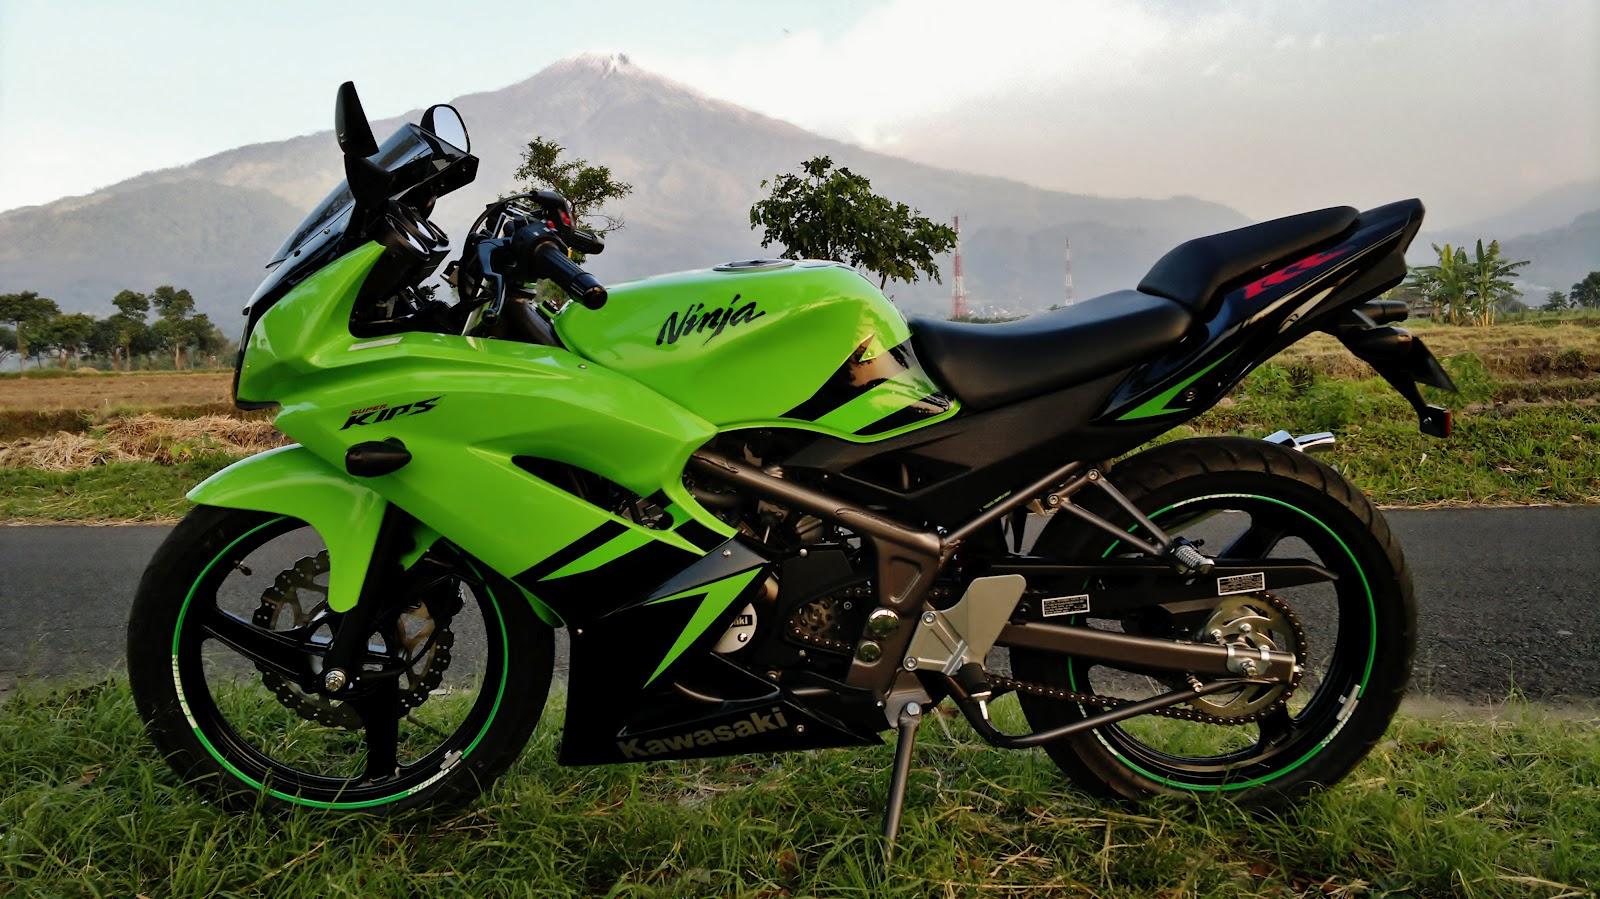 kawasaki ninja rr 2012 new (part 3)   the sound of engine